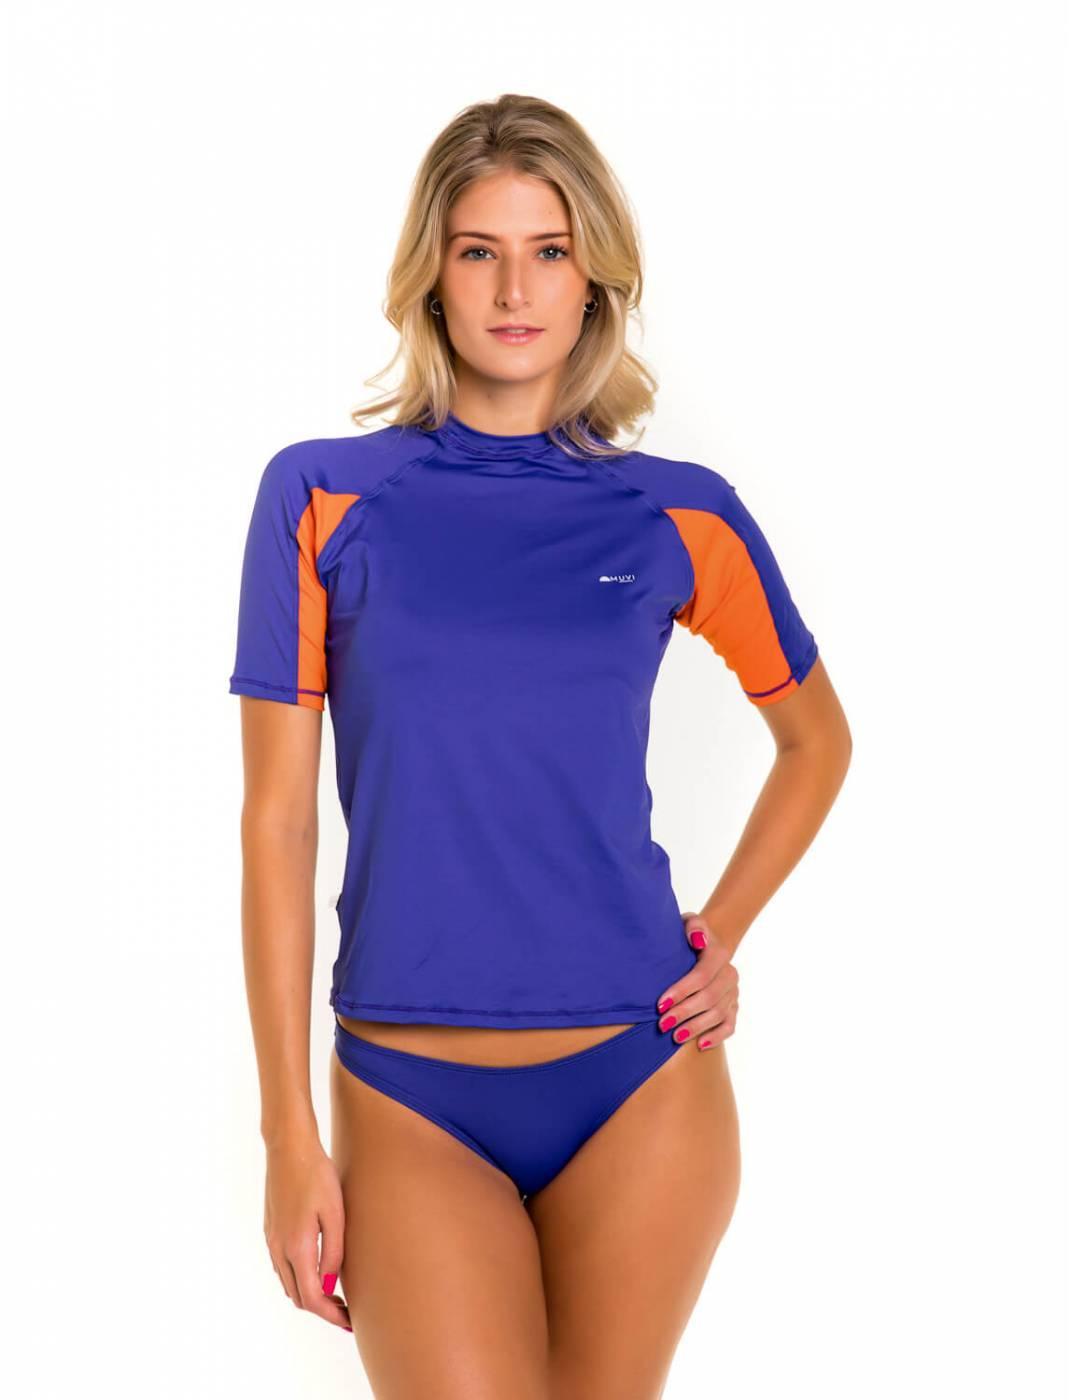 Camisa Feminina Slim Proteção Solar FPU50+ Muvi - Maresias